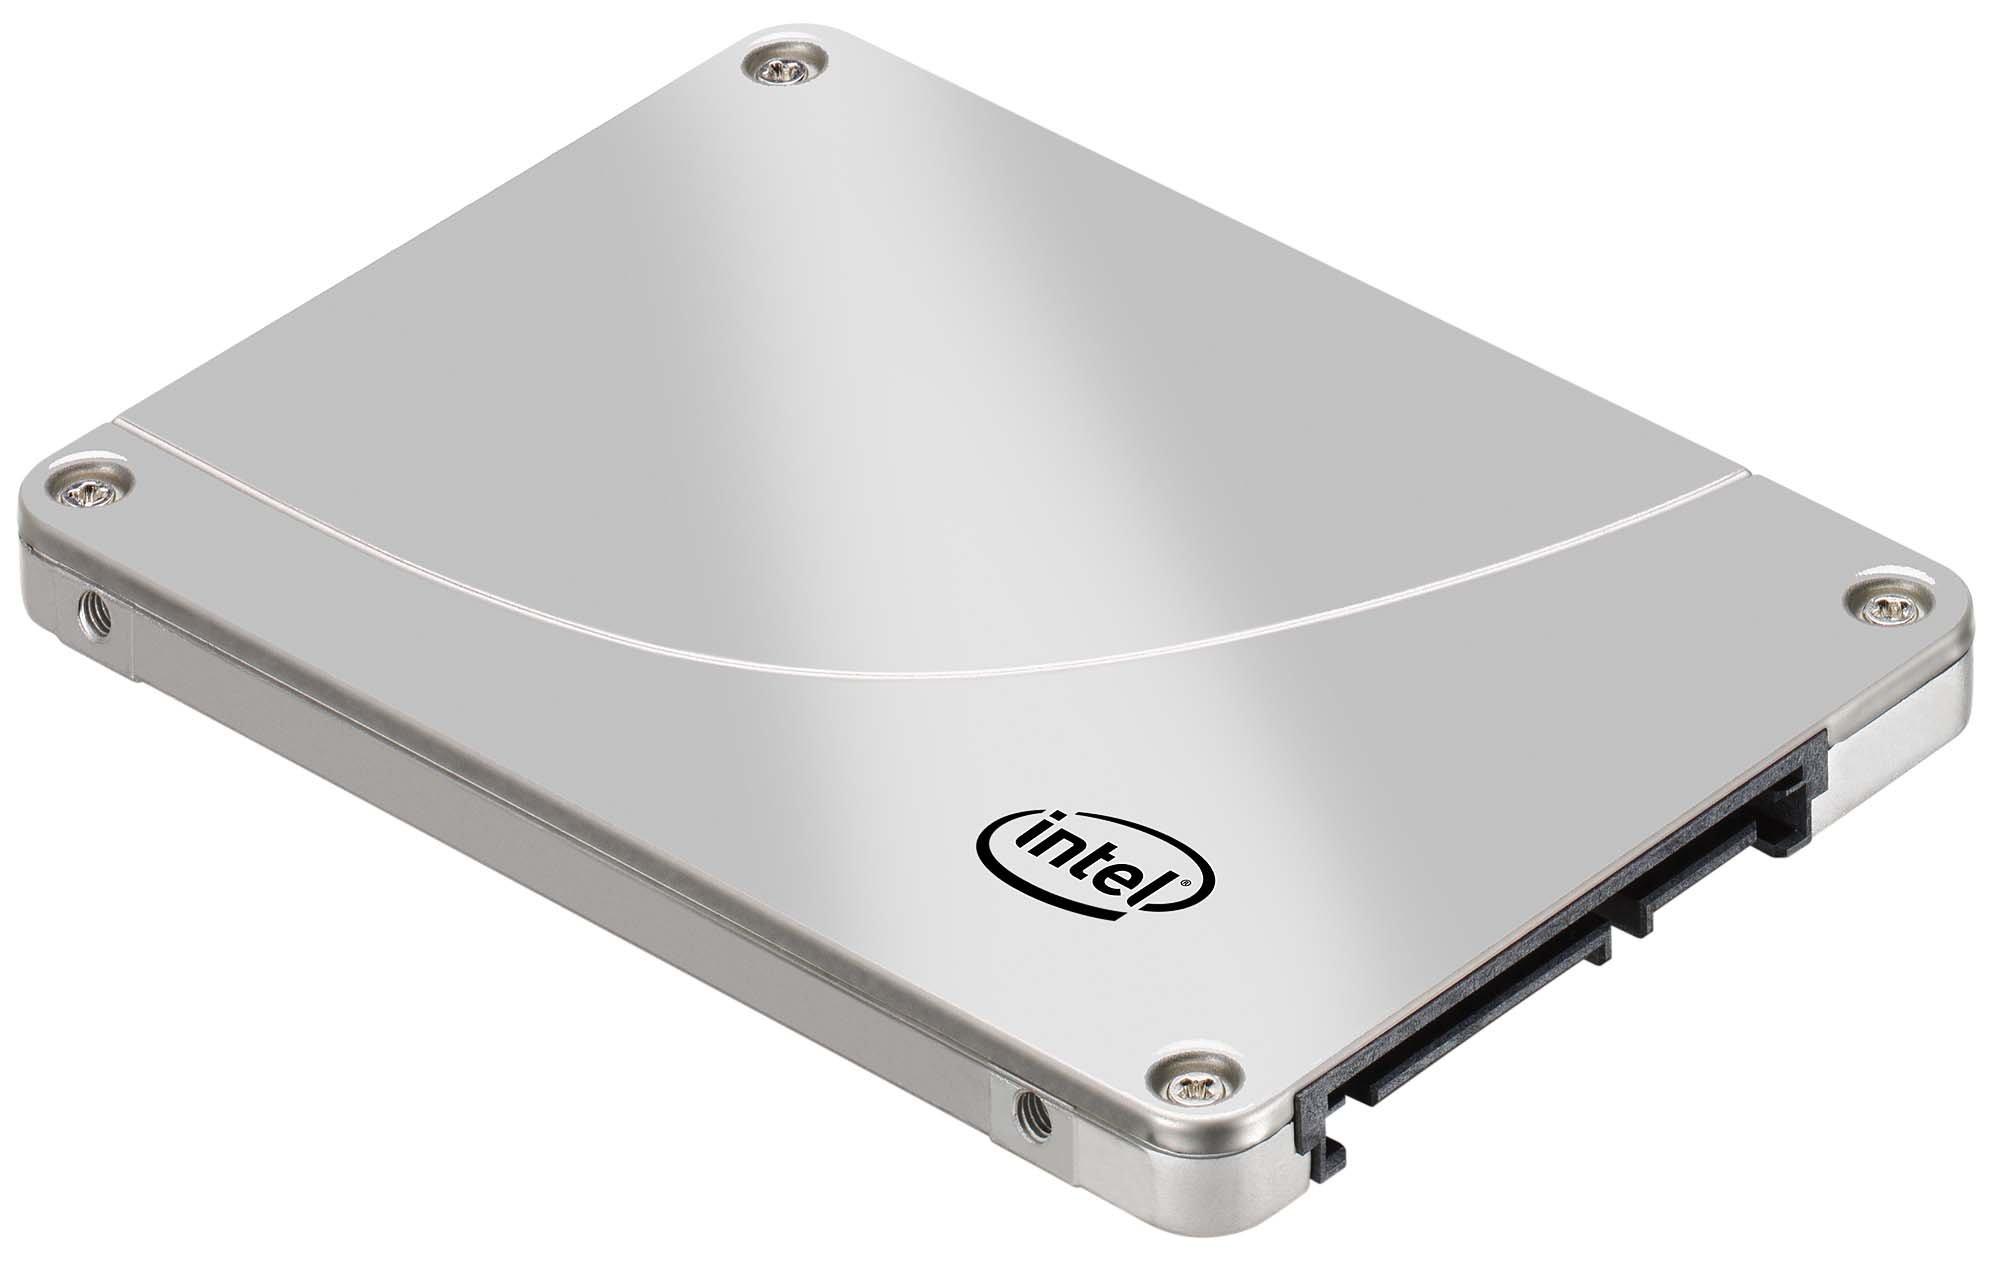 Intel 710 Series Solid-State Drive 300 GB SATA 3 Gb/s 2.5-Inch - SSDSA2BZ300G301 by Intel